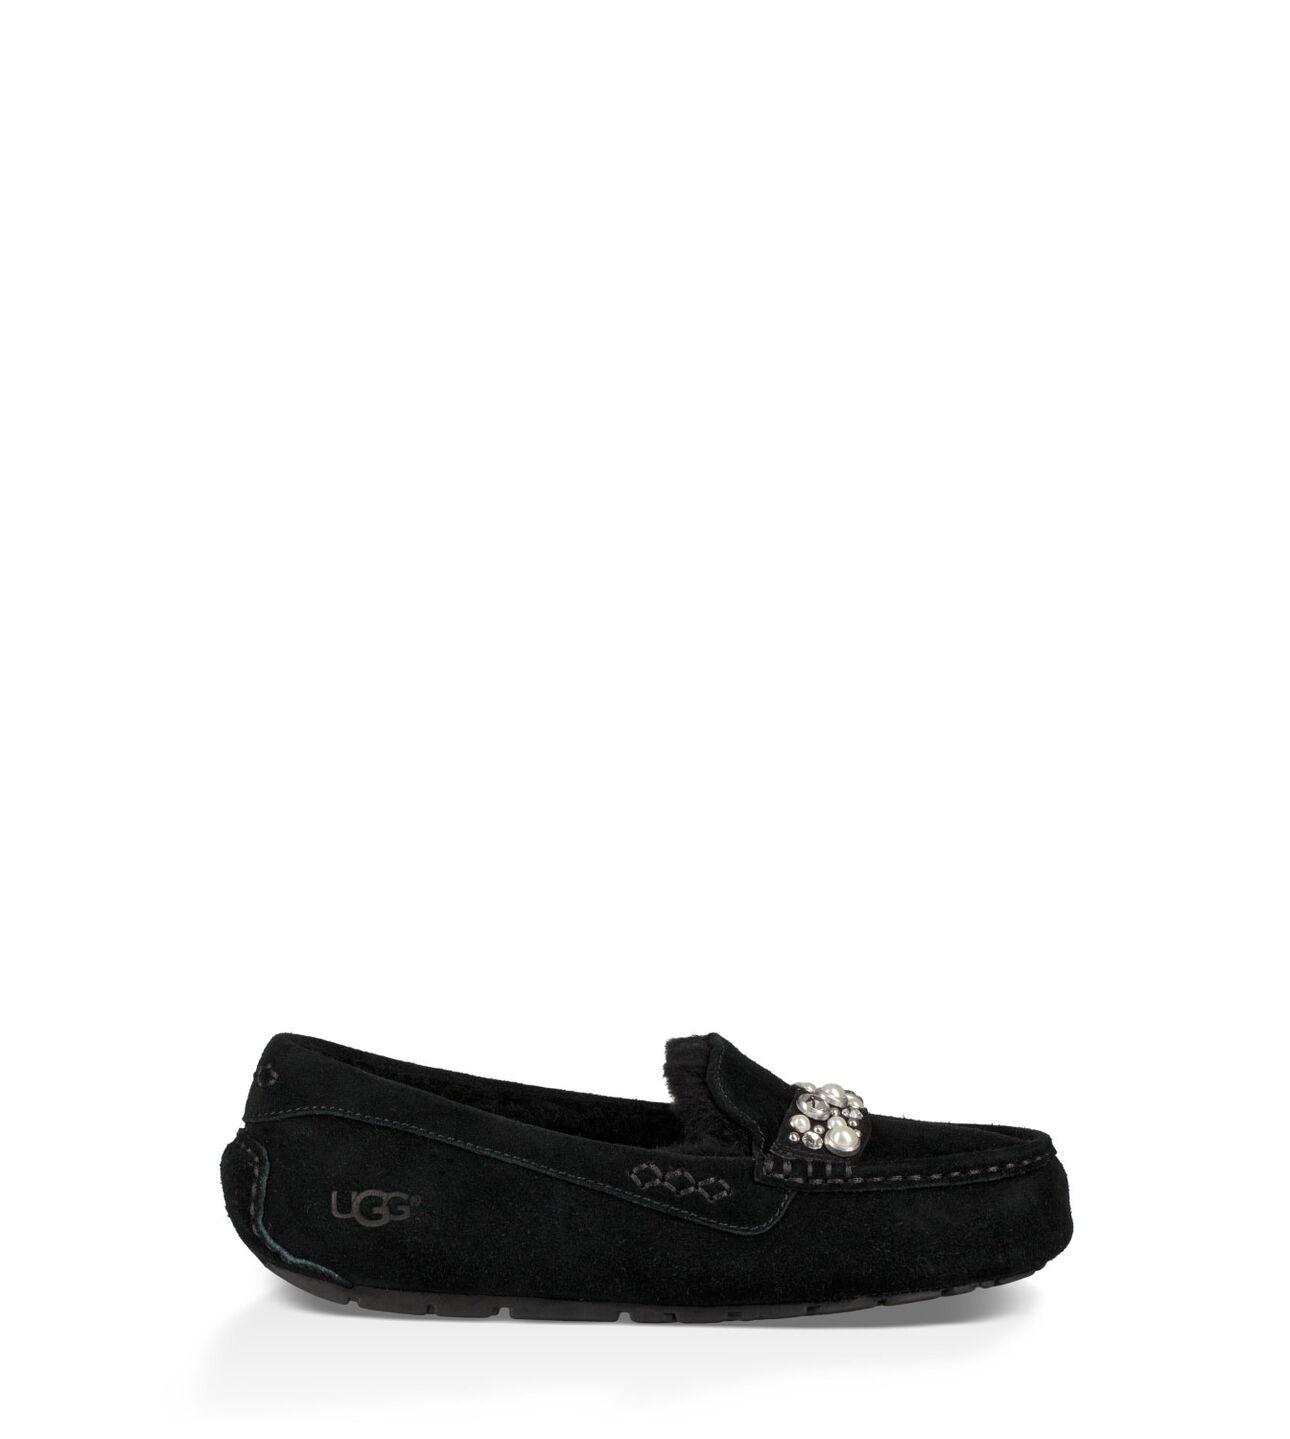 Ugg Slippers Ebay